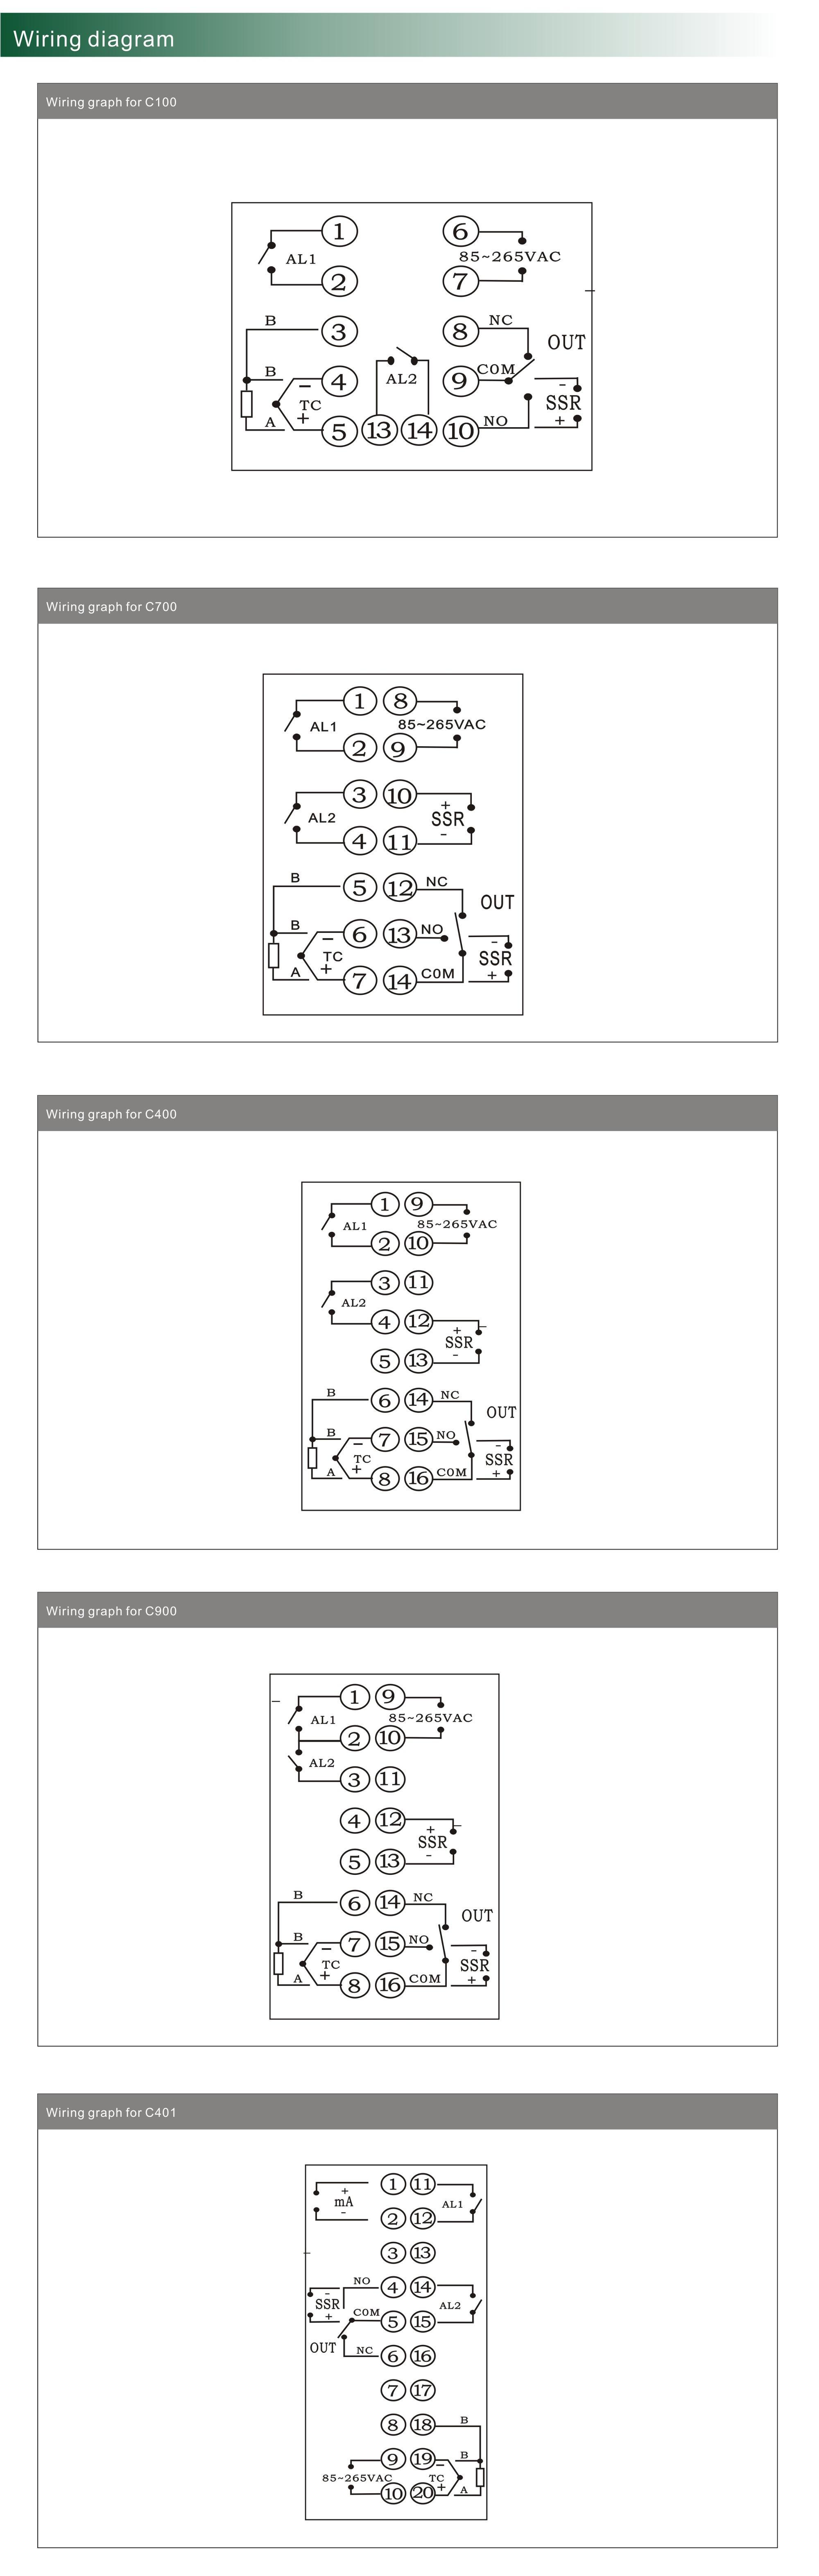 C400 Rex Thermostat Housing Display 0 10v Kiln Boiler Device Wiring Diagram